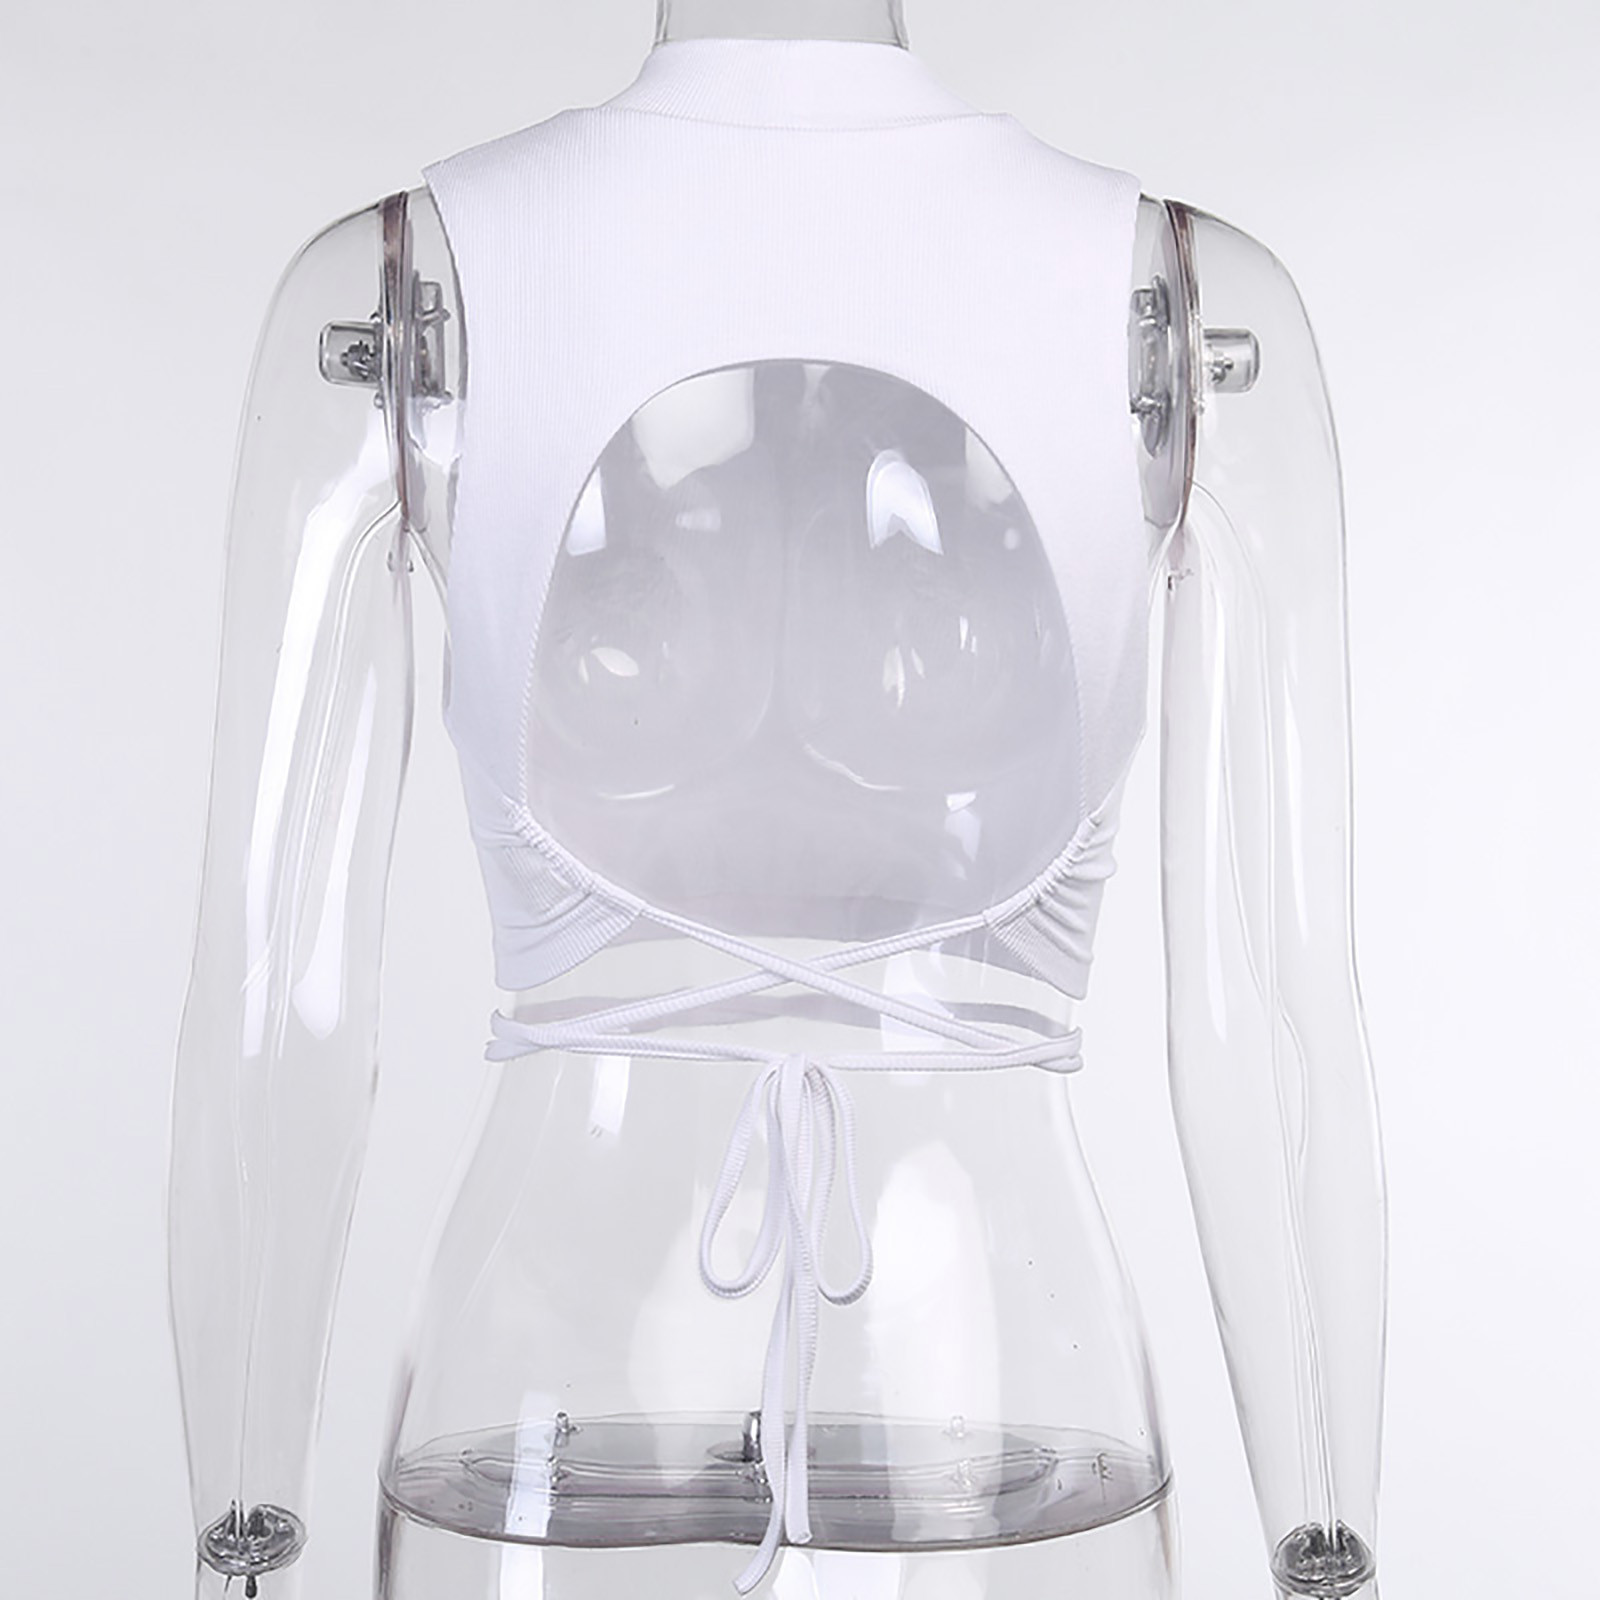 4# Women's Tops Sleeveless Sexy Cool Single One Shoulder Tank Tops Vest Bare Midriff Sleeveless T shirt Summer Beach Crop Top